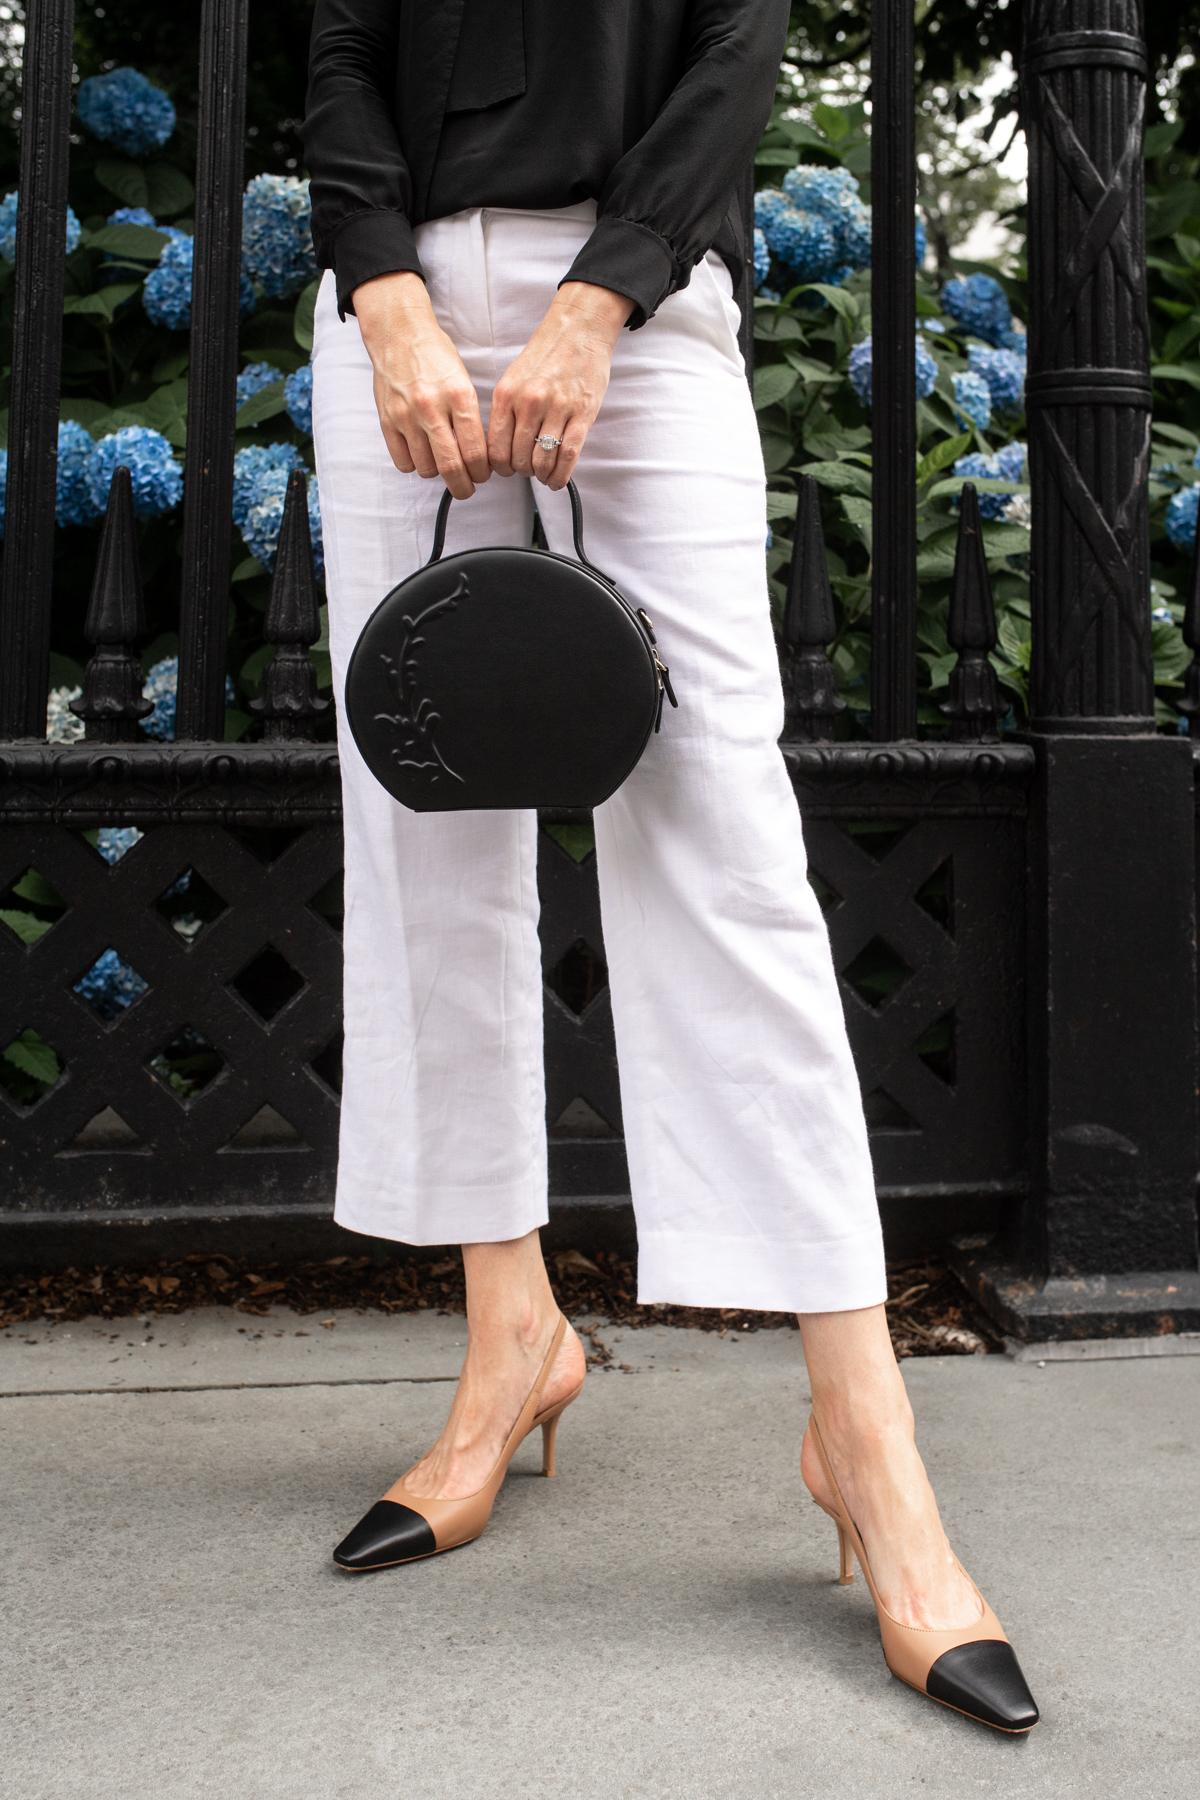 Stacie Flinner x Tell No Leyes Bag-6.jpg